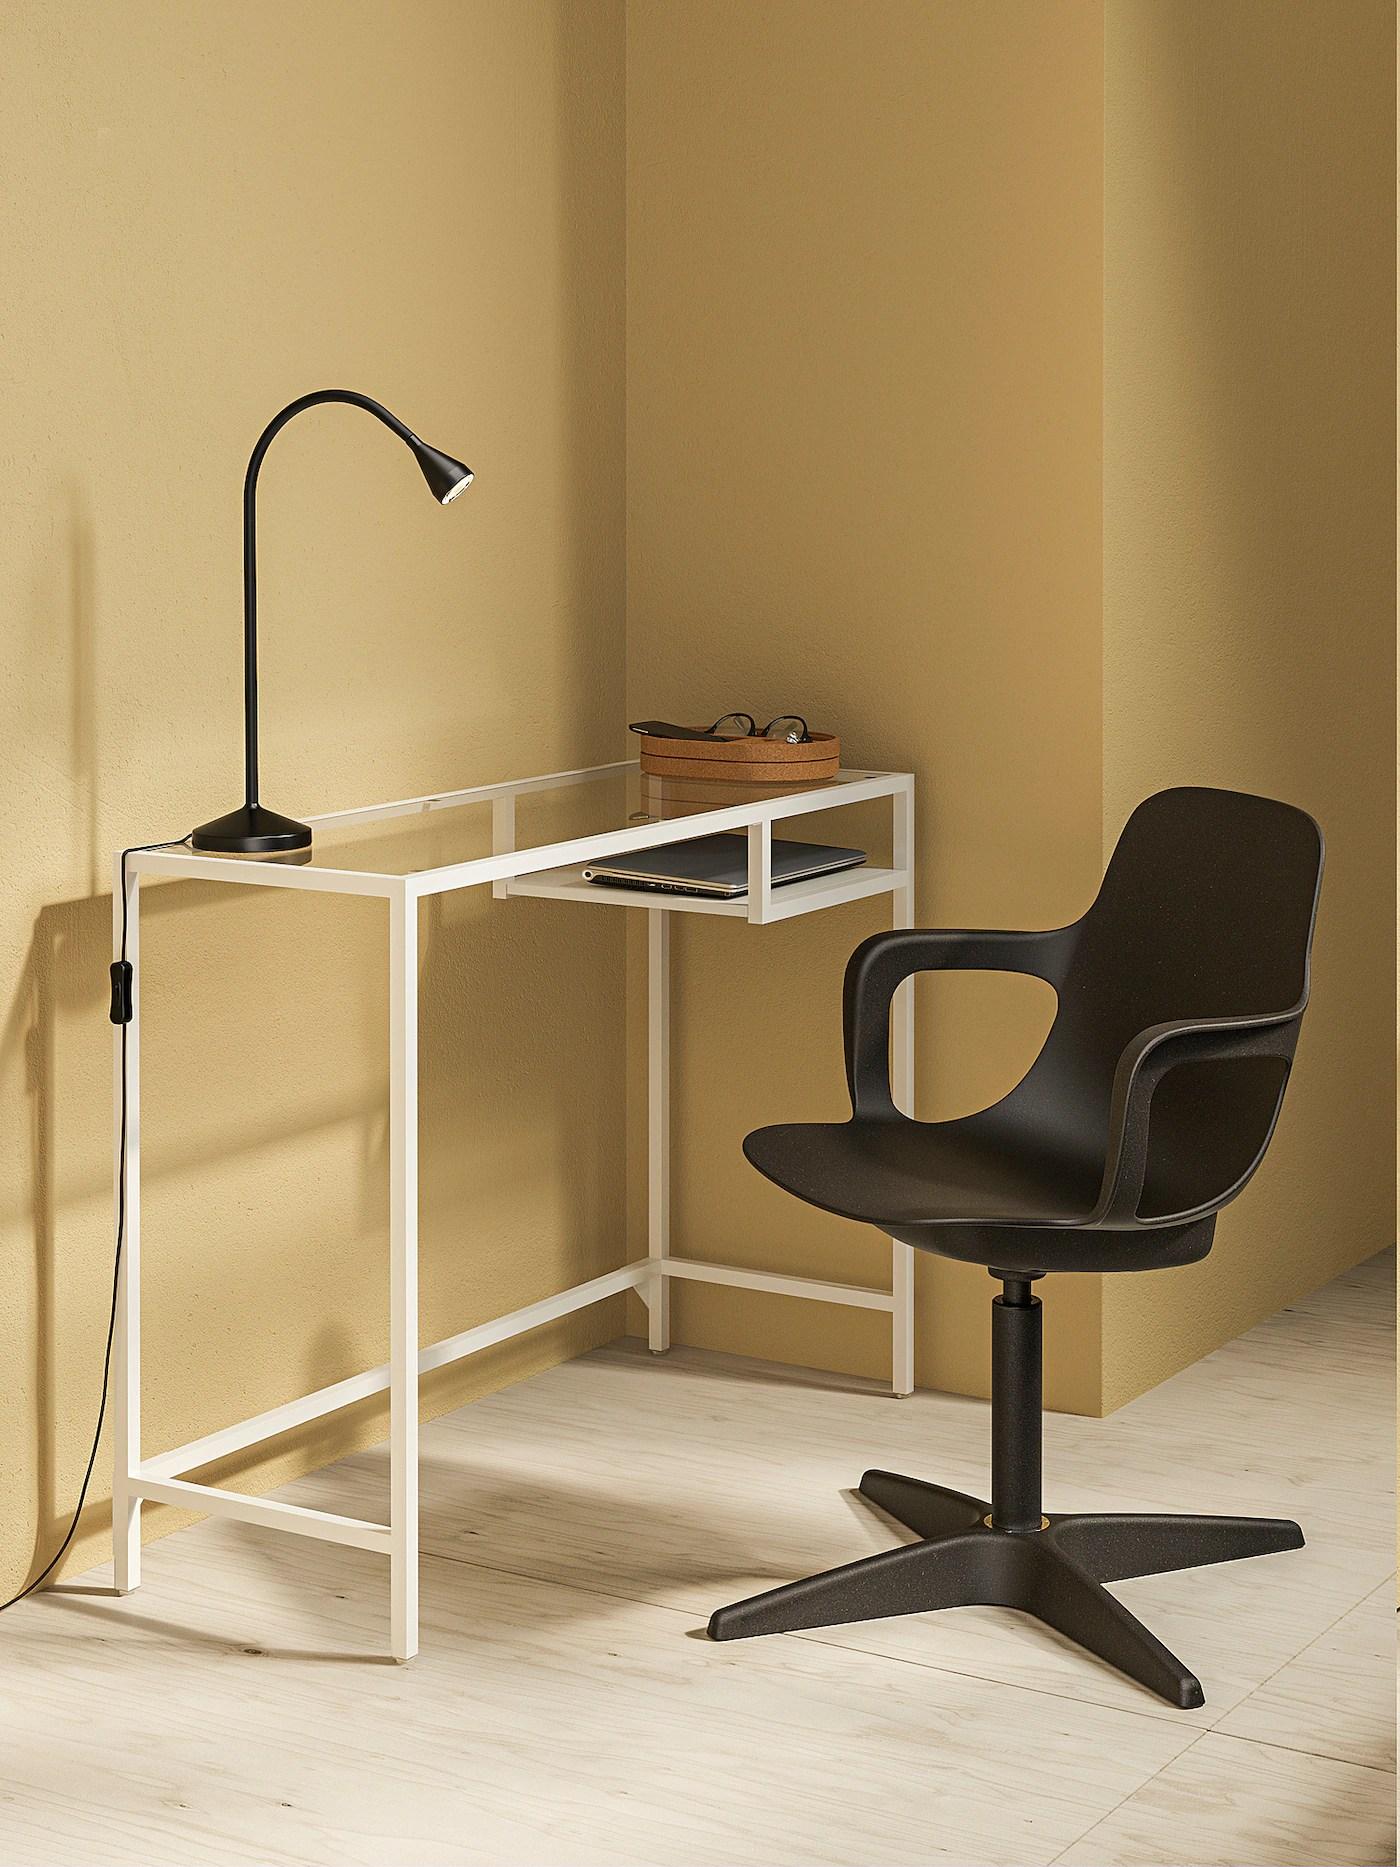 Vittsjo Table Ordinateur Portable Blanc Verre 100x36 Cm Ikea Suisse